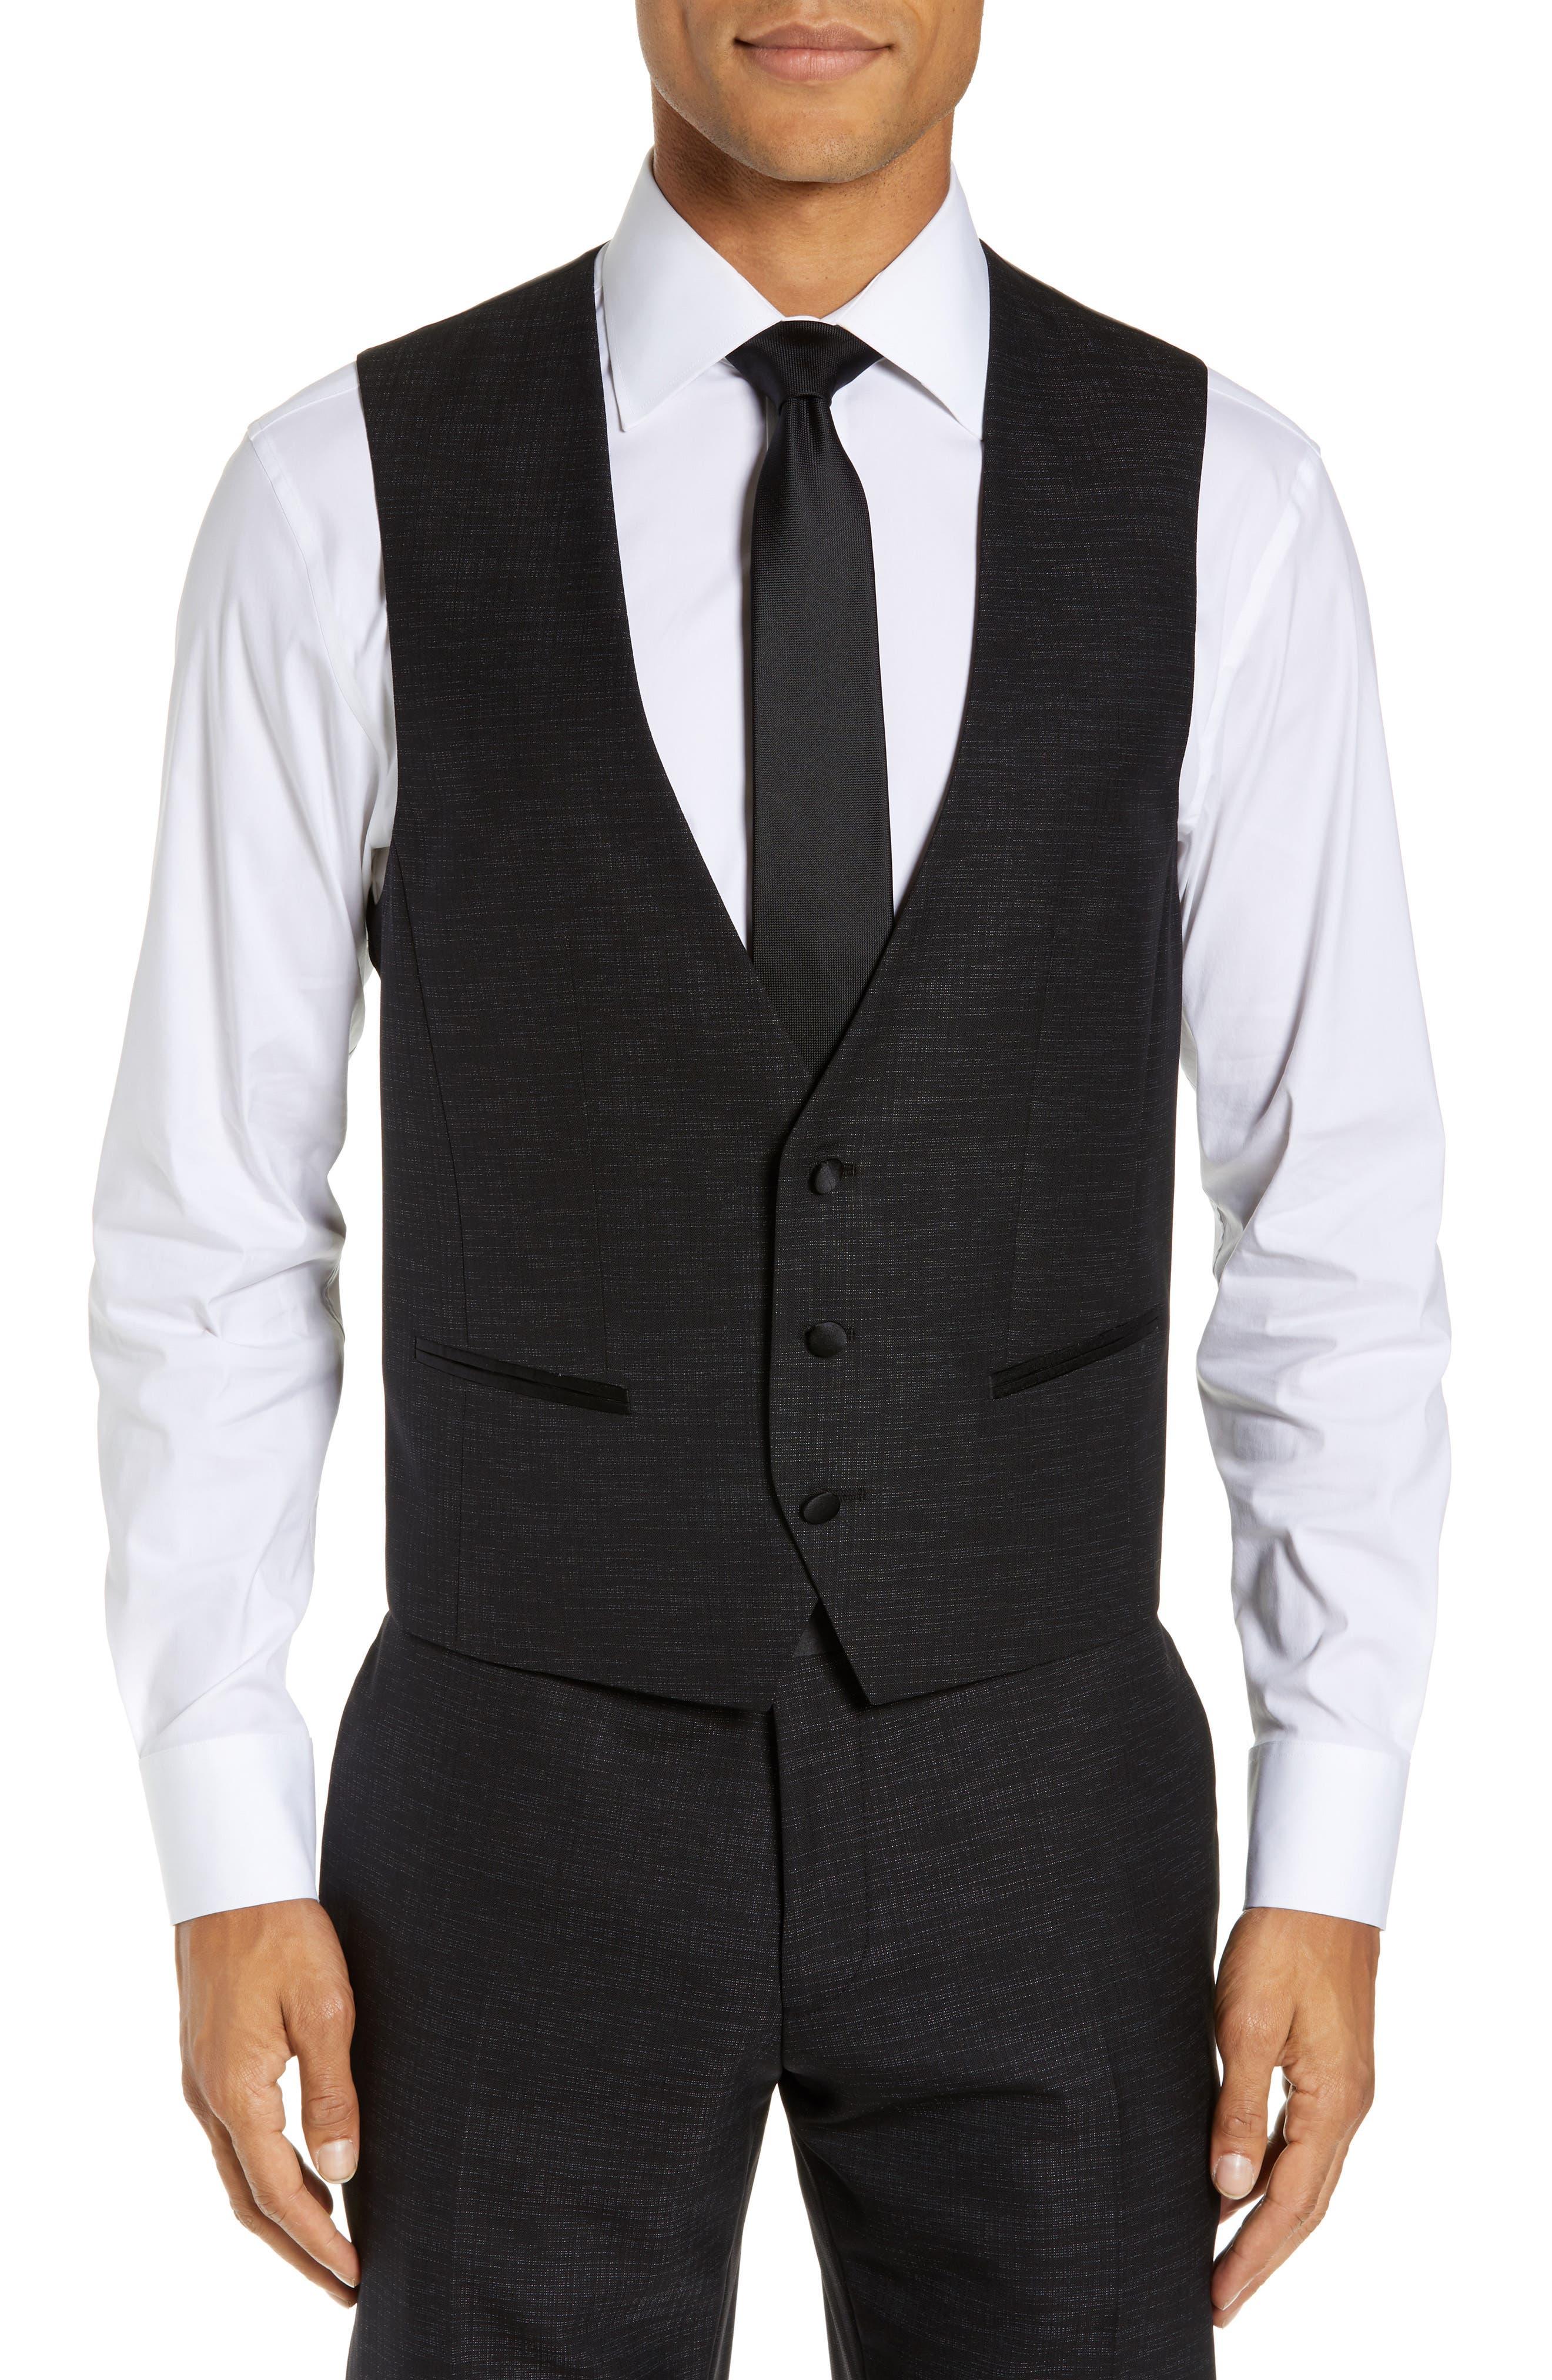 BOSS,                             Rendal/Wilden Slim Fit Three-Piece Tuxedo,                             Alternate thumbnail 6, color,                             BLACK